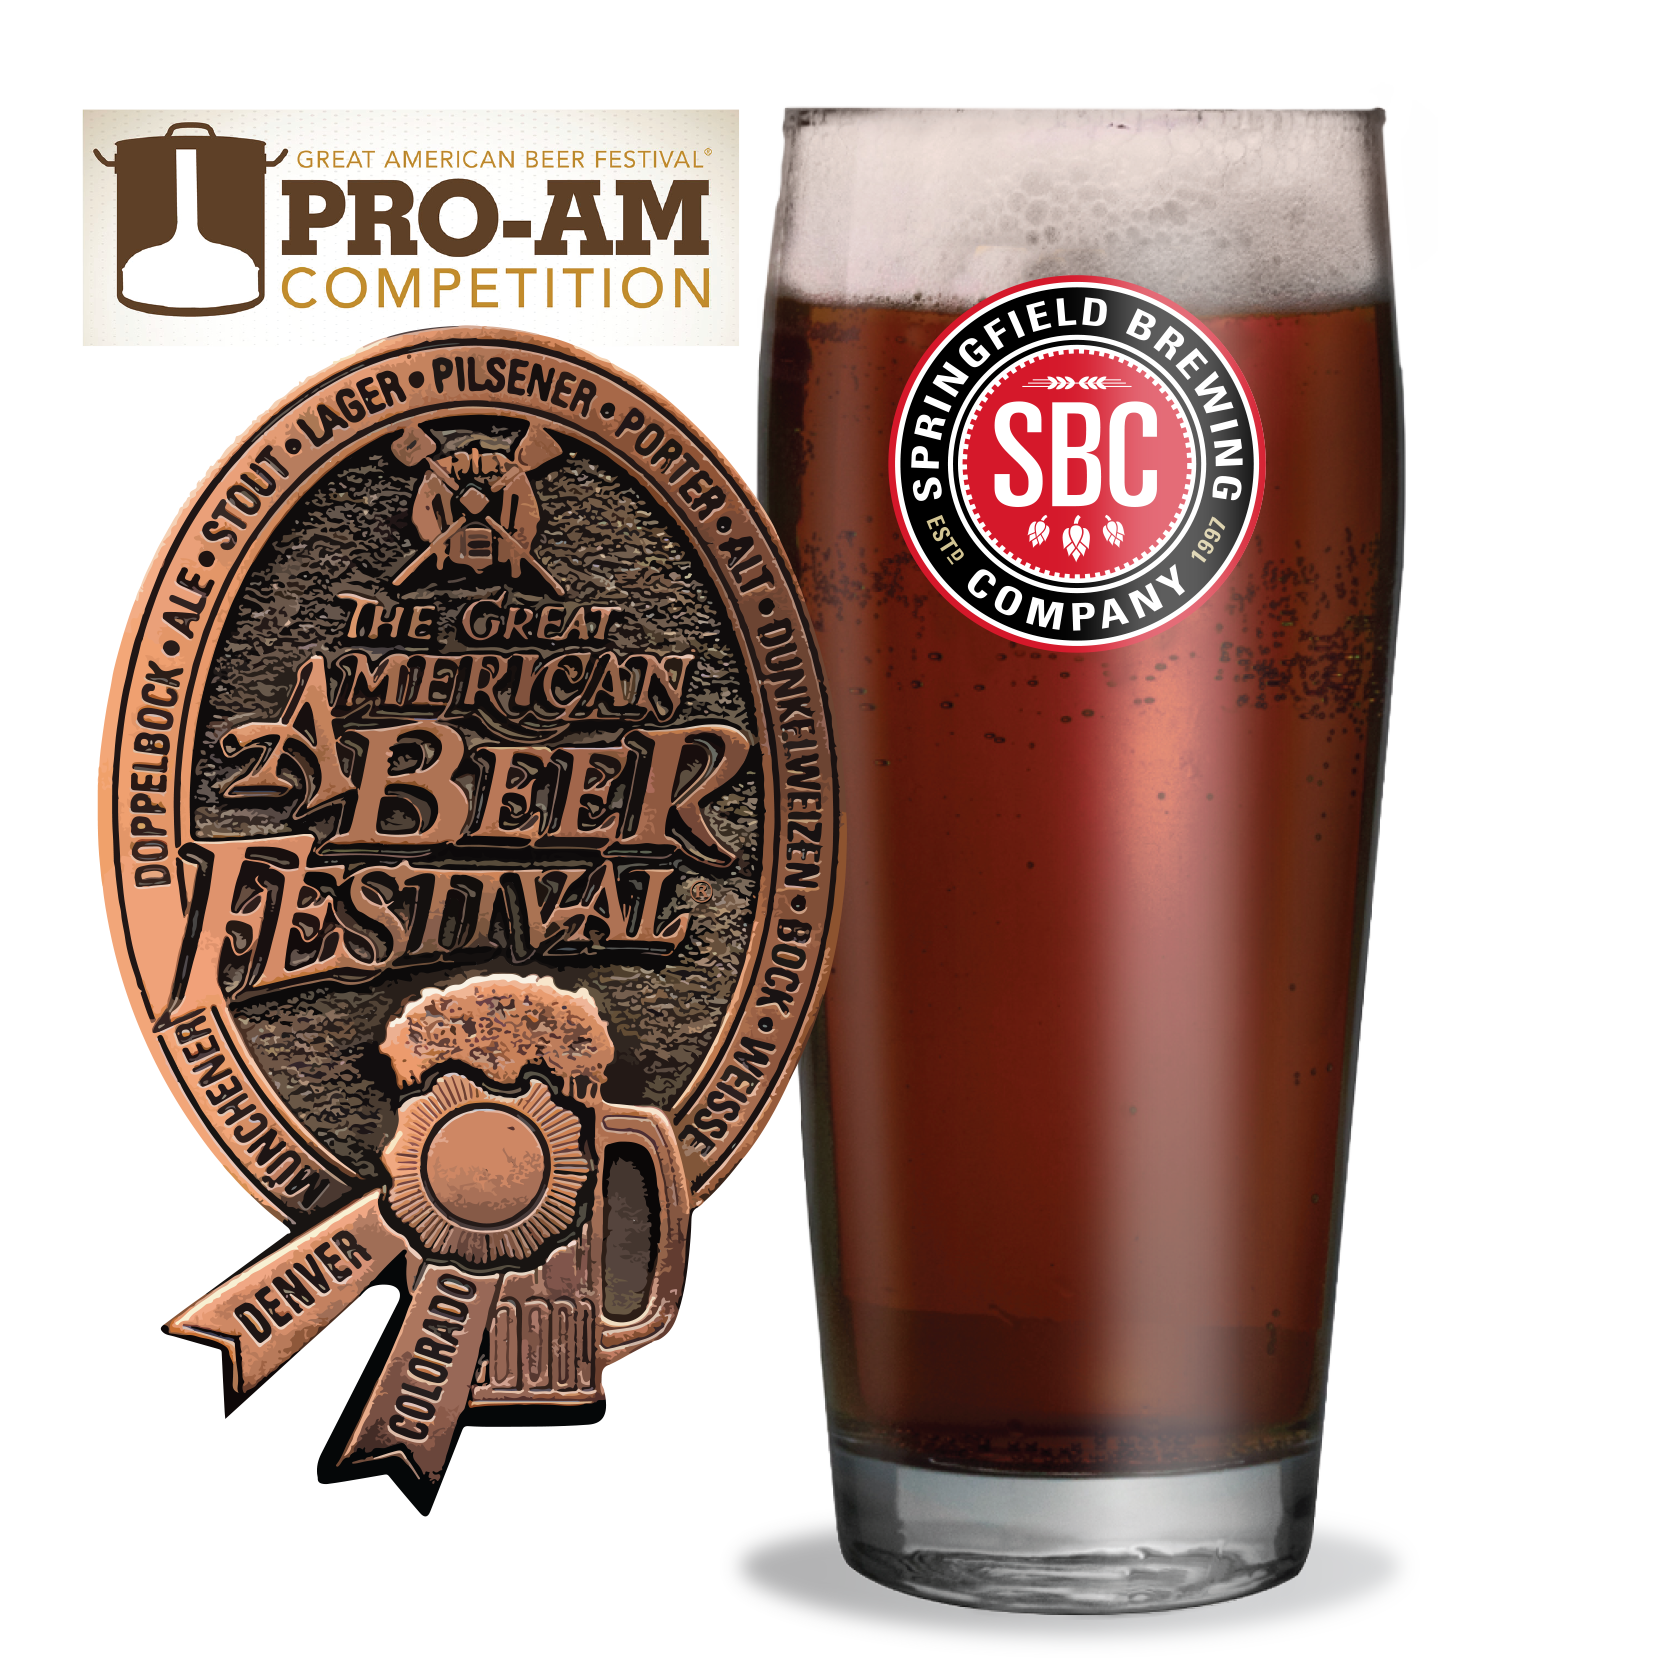 https://brewery.springfieldbrewingco.com/wp-content/uploads/2021/07/GABF_2014-1.png